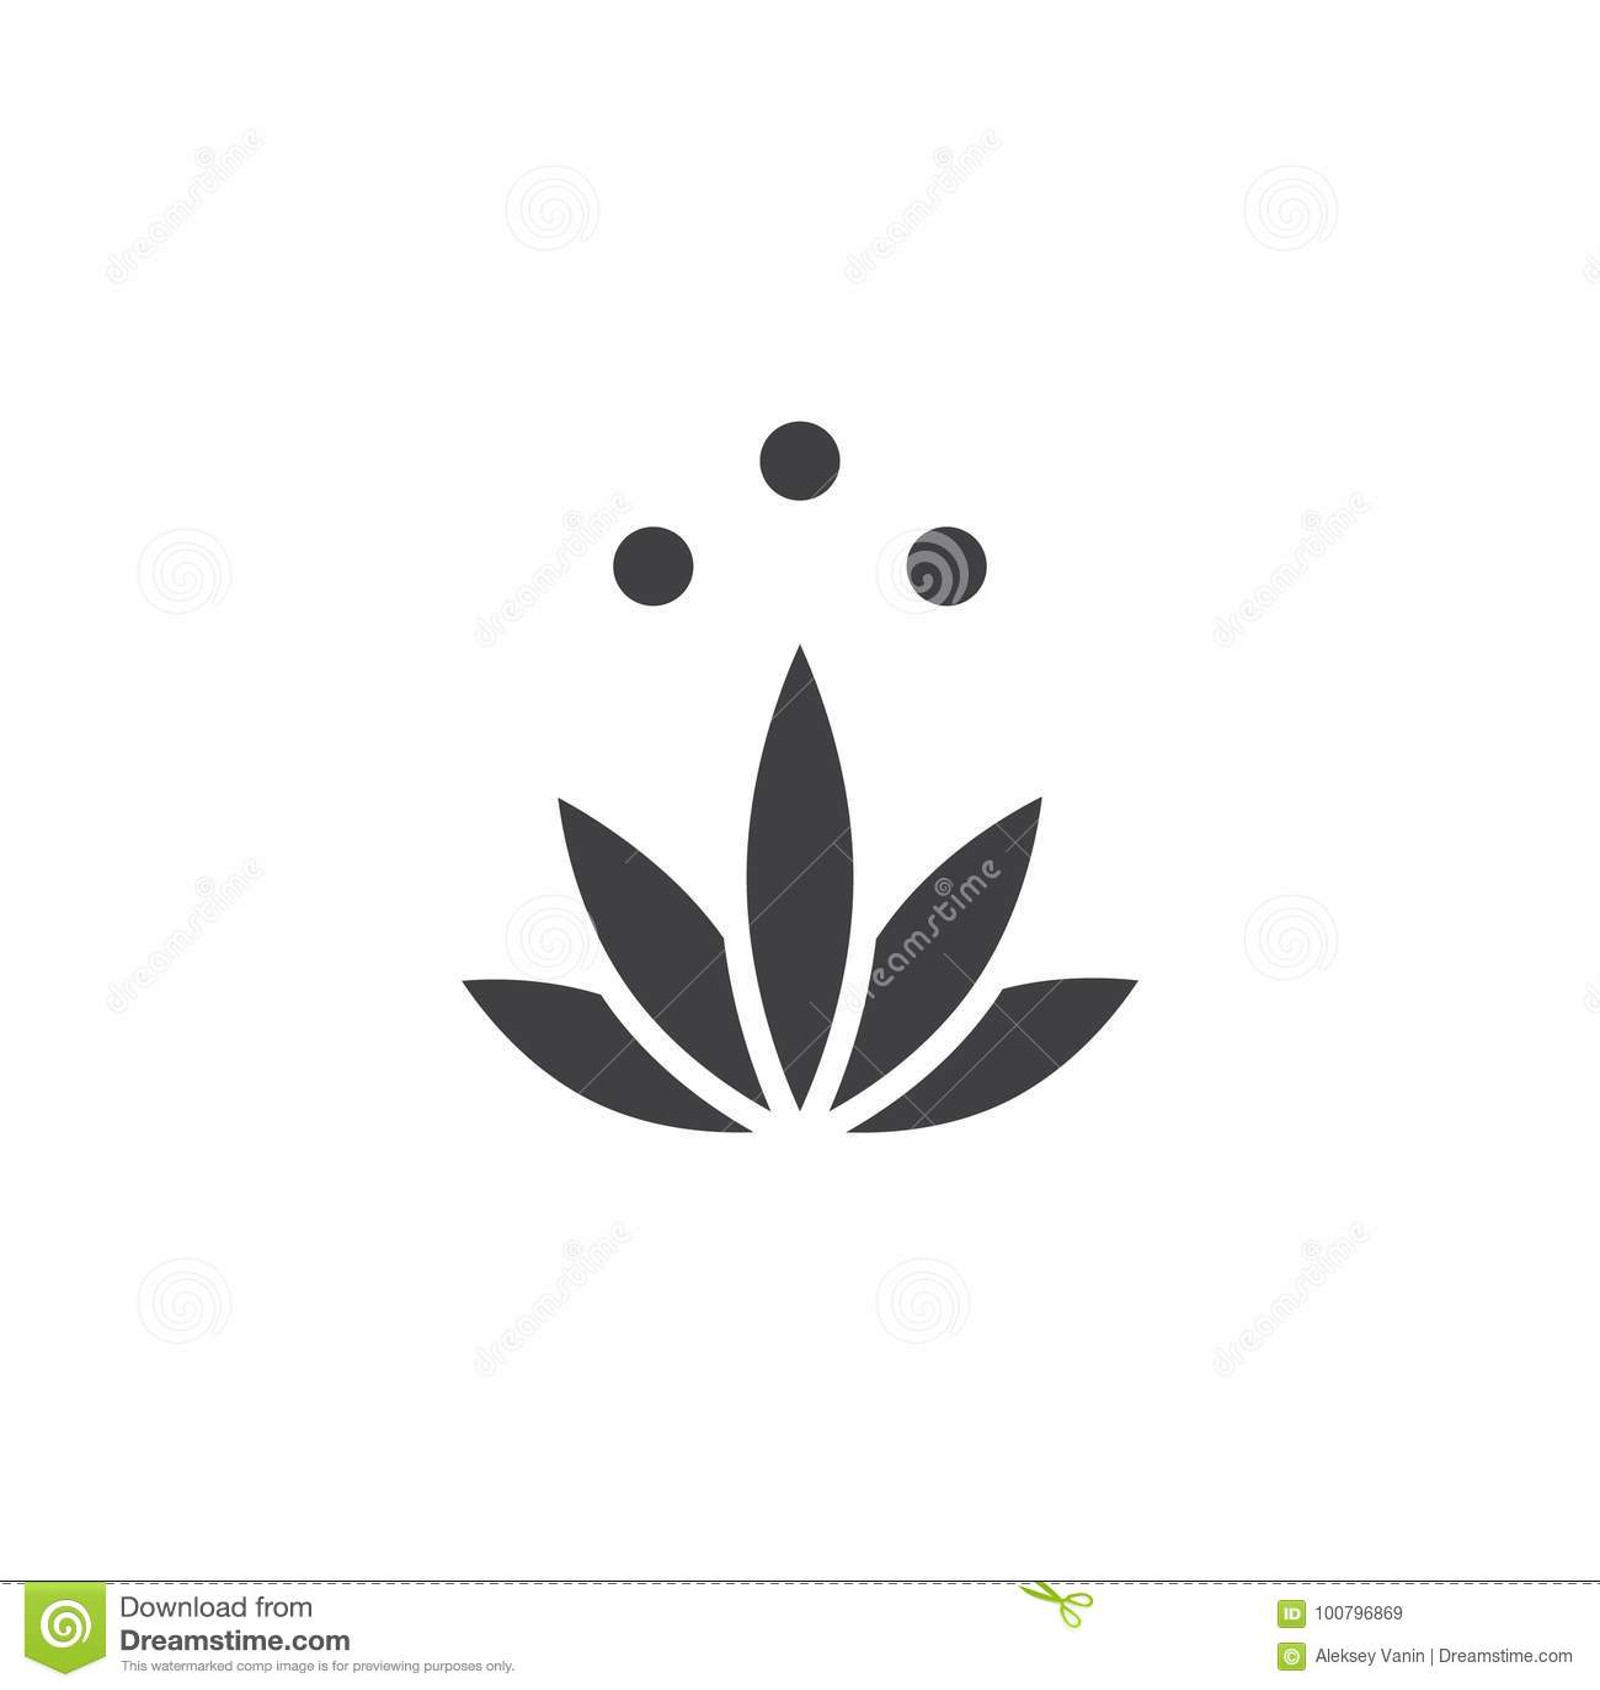 Meditation icon vector stock vector illustration of vector 100796869 meditation icon vector filled flat sign solid pictogram isolated on white lotus flower symbol logo illustration mightylinksfo